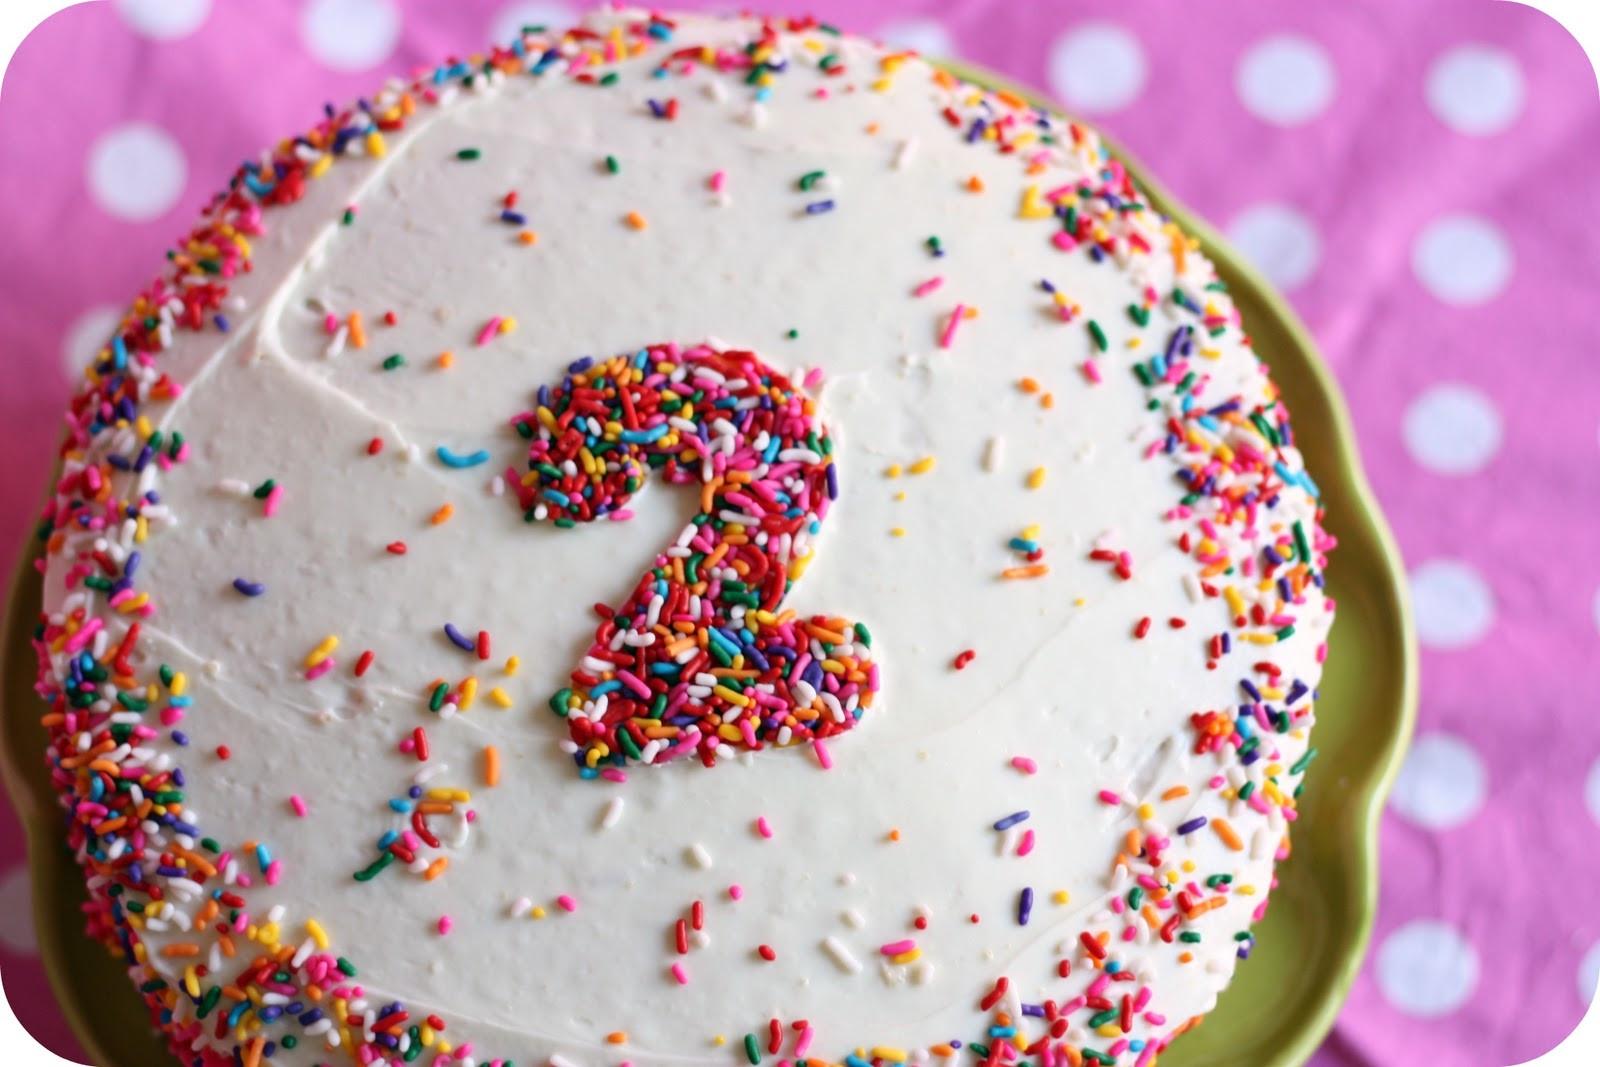 Homemade Birthday Cake Ideas  Simple Homemade Birthday Cake littlelifeofmine